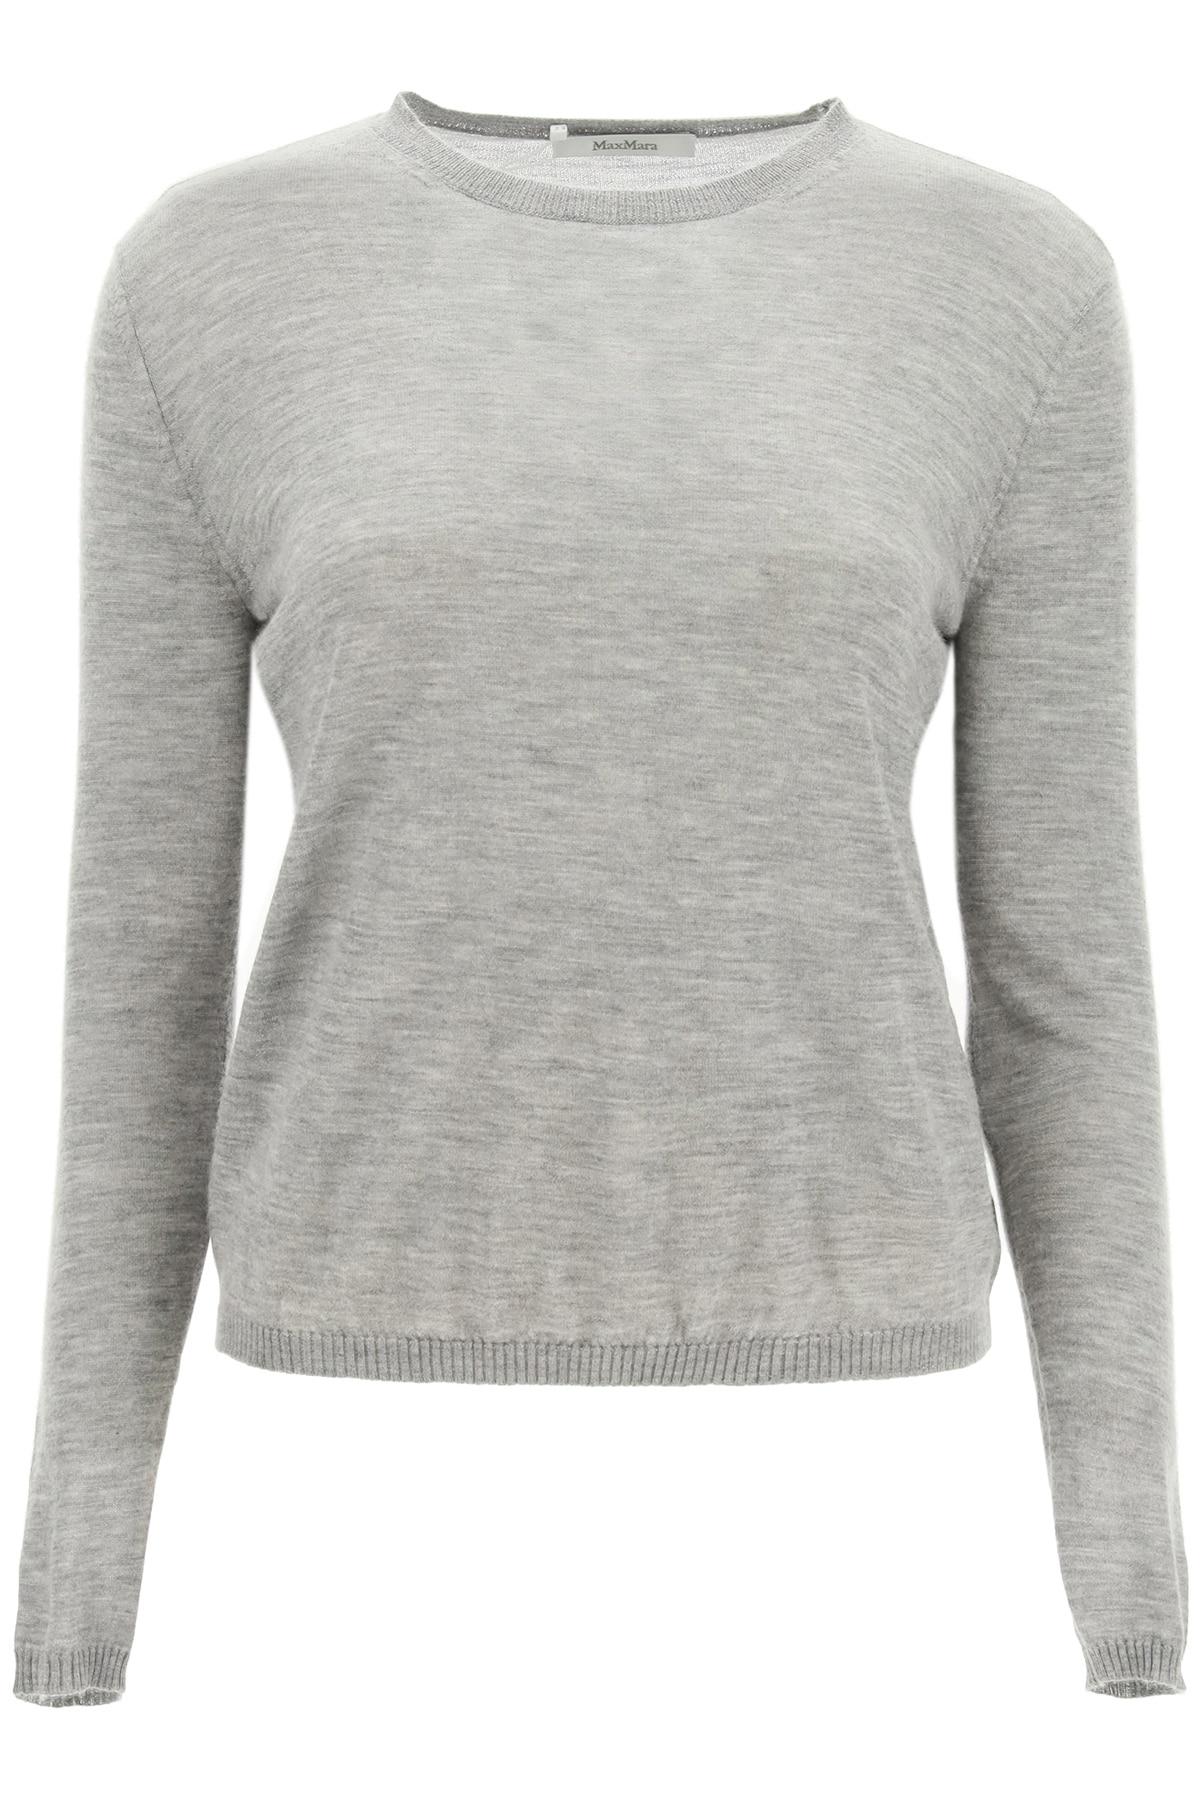 MAX MARA CASHMERE SWEATER XS Grey Cashmere